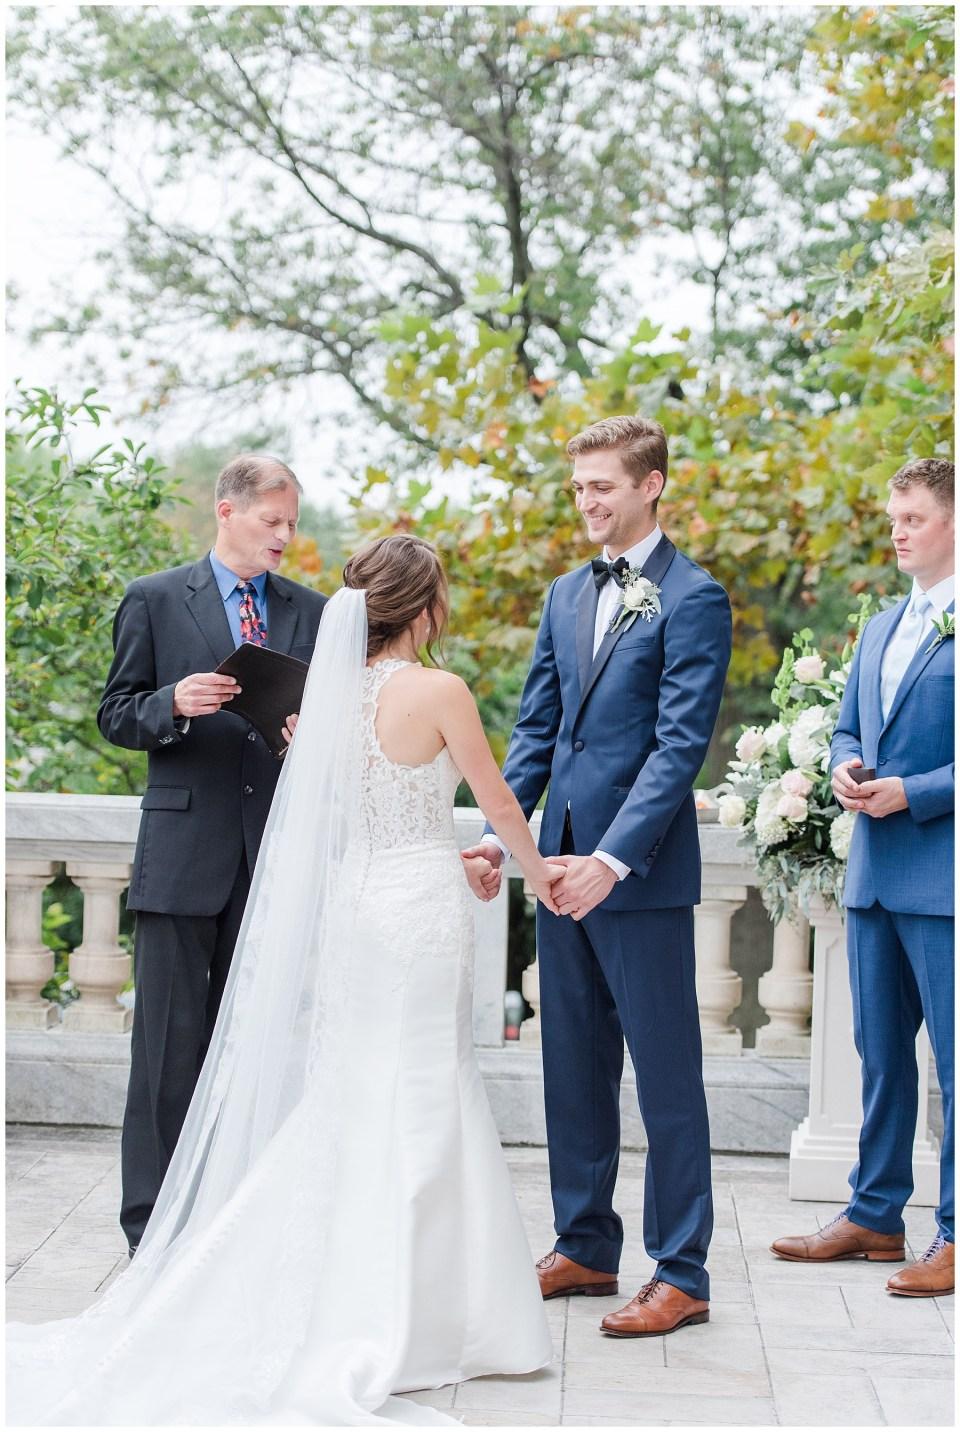 daughters-of-the-american-revolution-dar-dc-wedding-photos-dc-wedding-photographer-fall-wedding-photo-98_photos.jpg